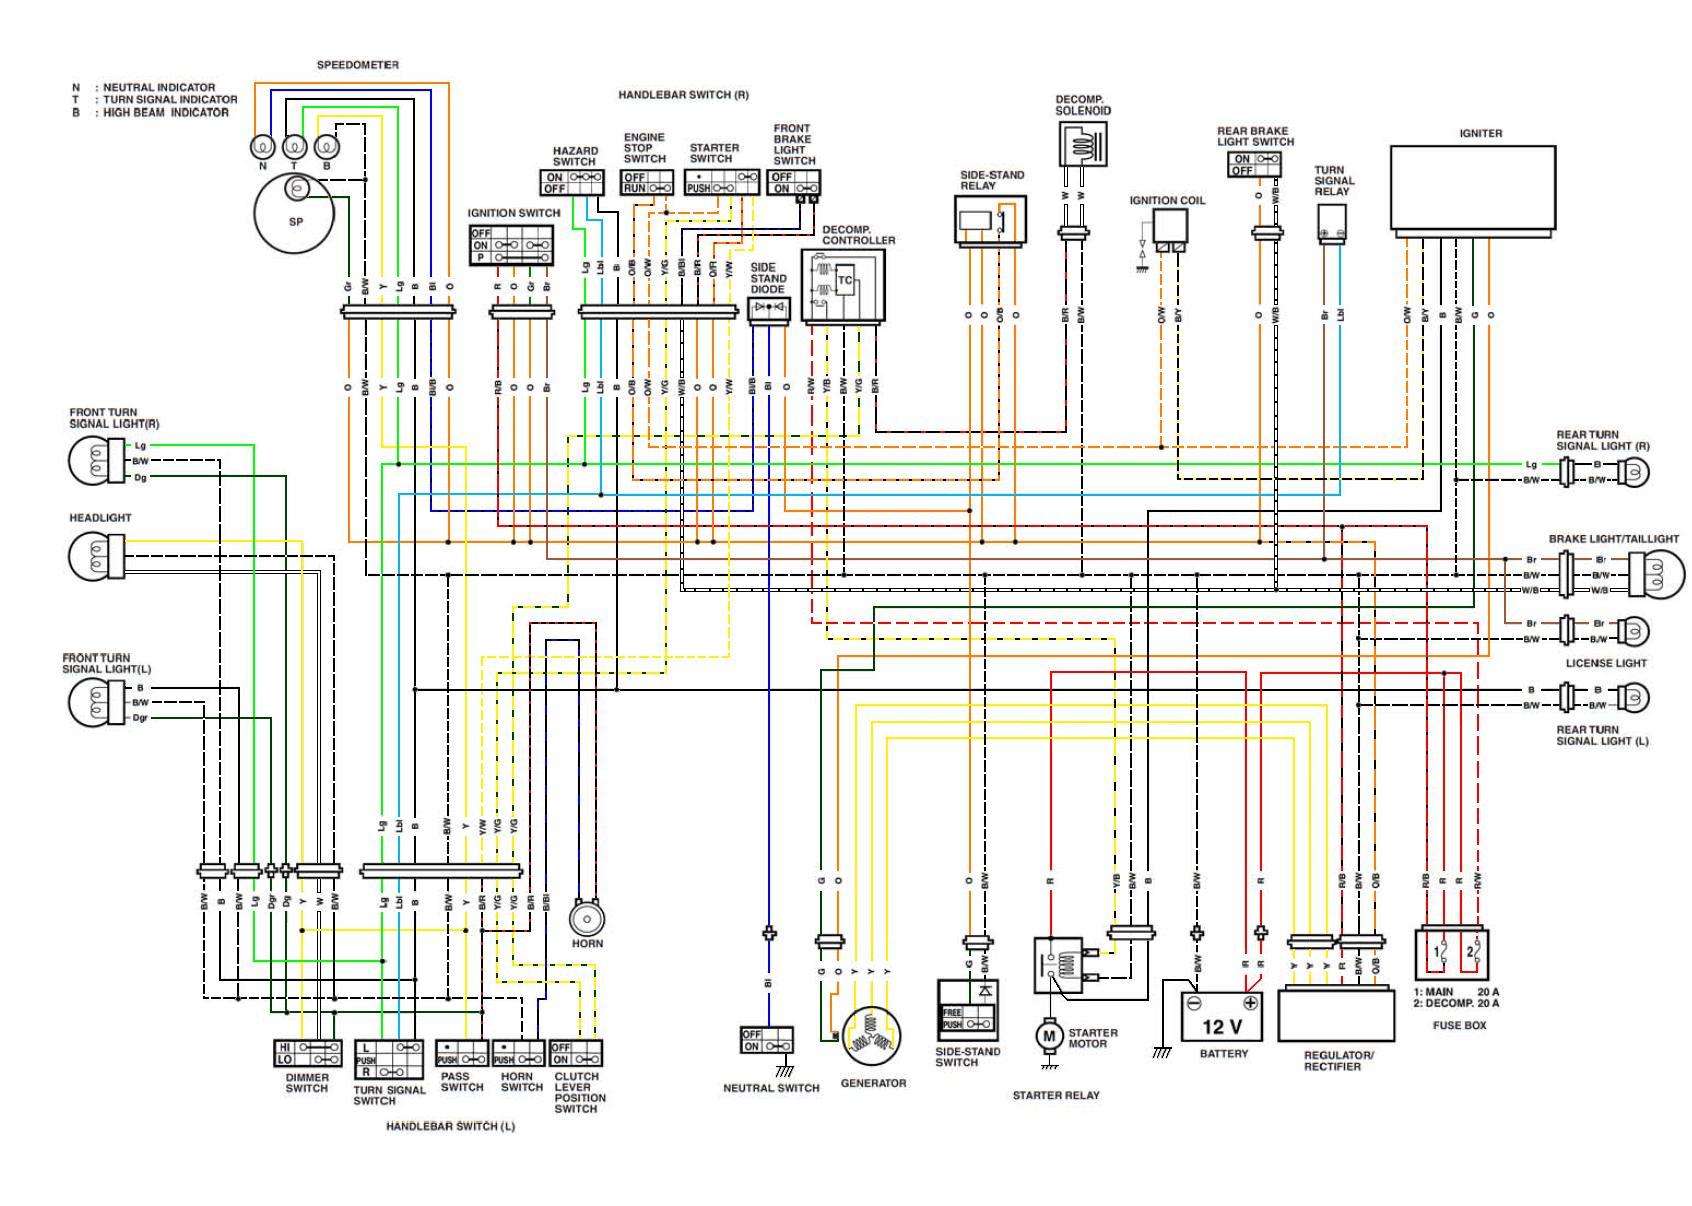 Sensational Harley Softail Wiring Harness Wiring Diagram Wiring Cloud Onicaxeromohammedshrineorg